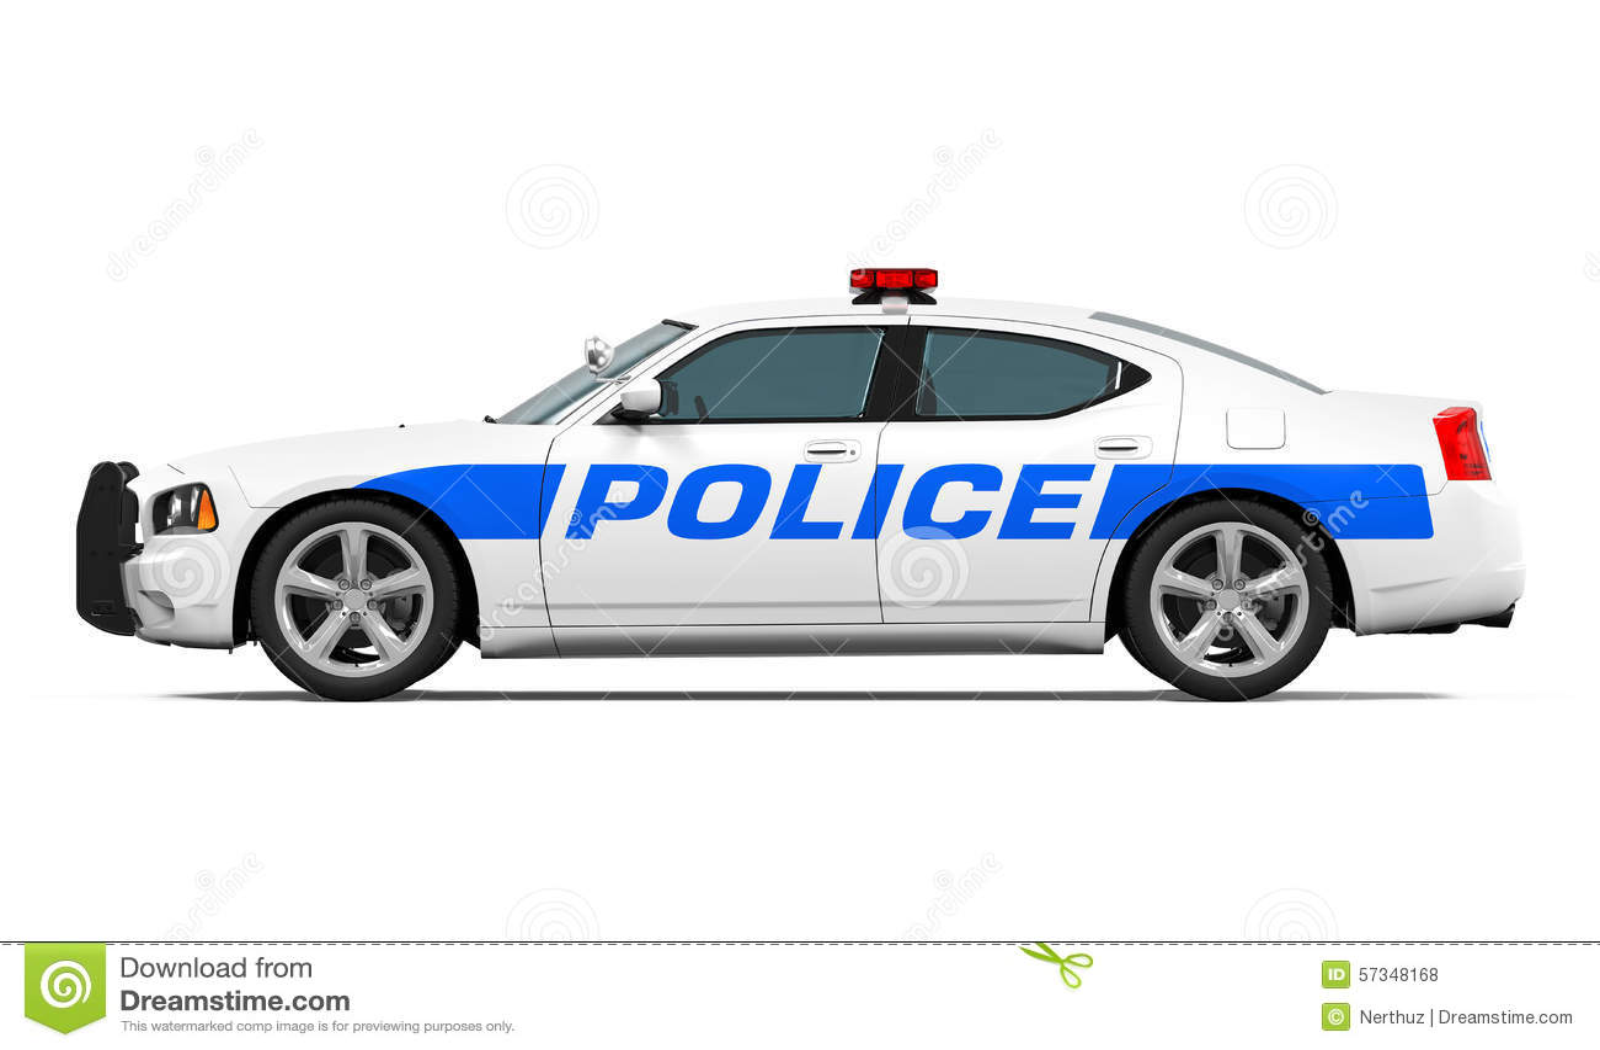 Police Car Isolated Stock Photo - Image: 57348168